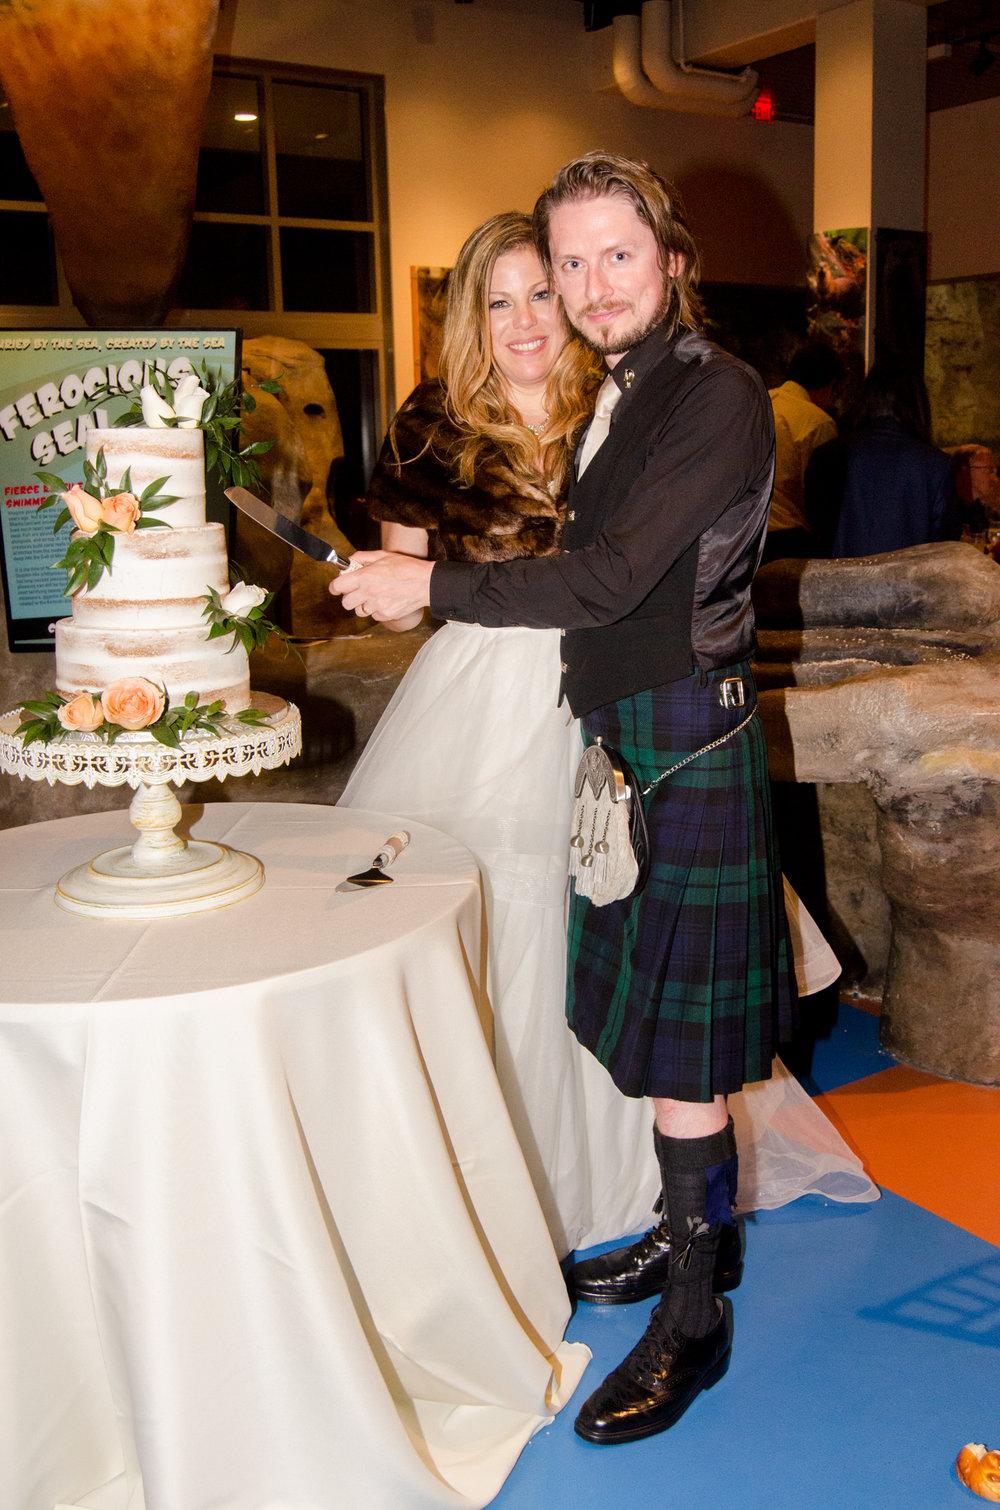 WEB_6-18-17_MindyChris_Wedding-877.jpg